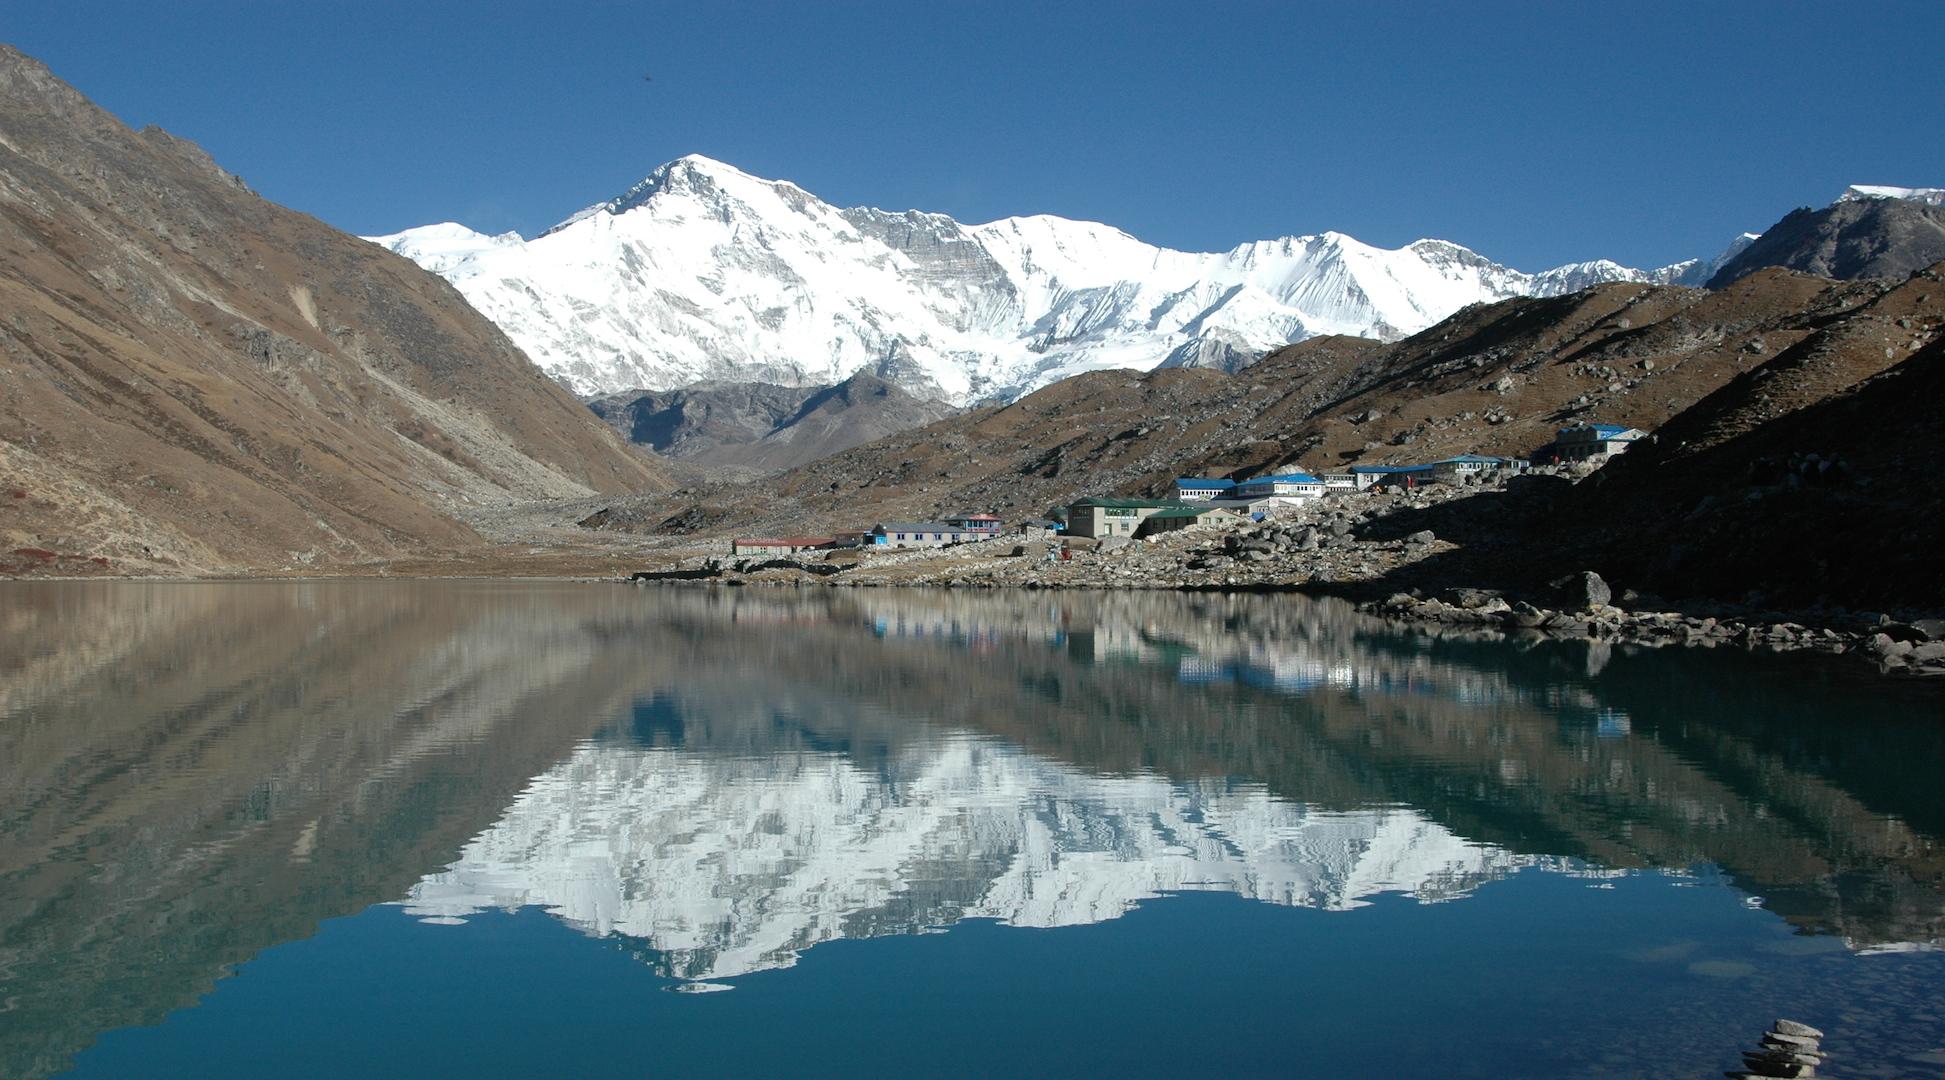 Everest region treks